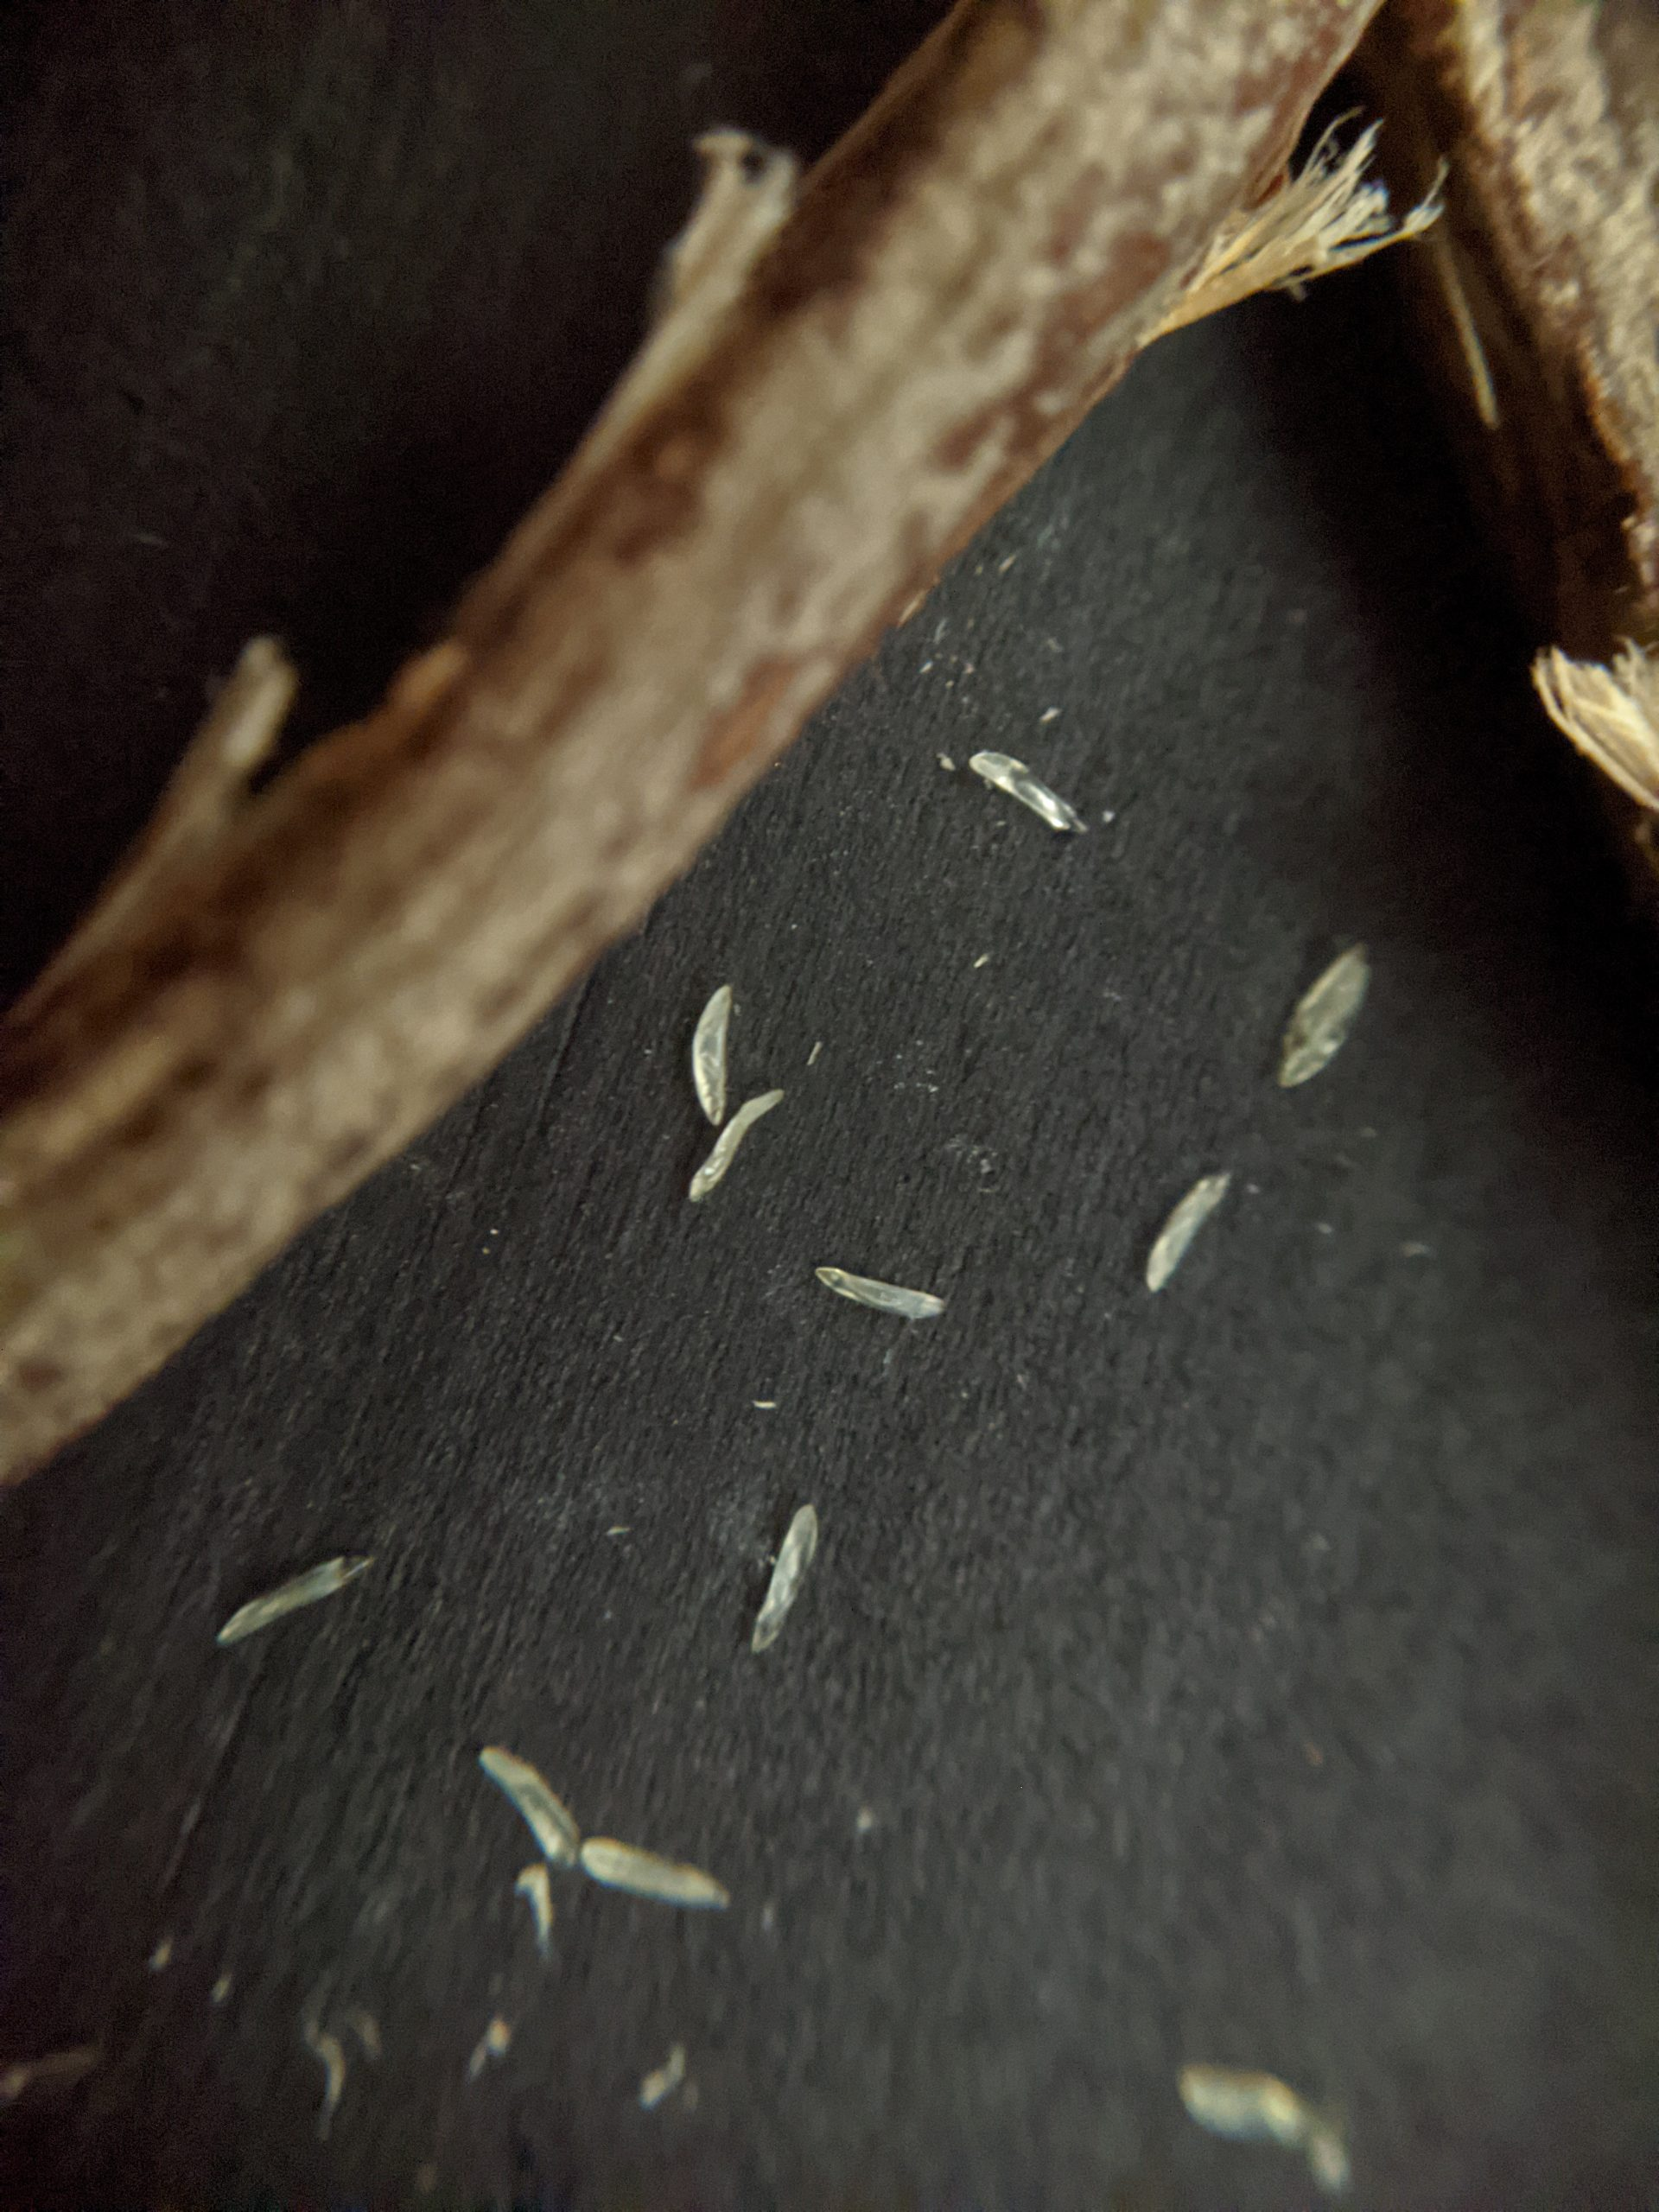 Cicada eggs on a black backdrop next to a branch.